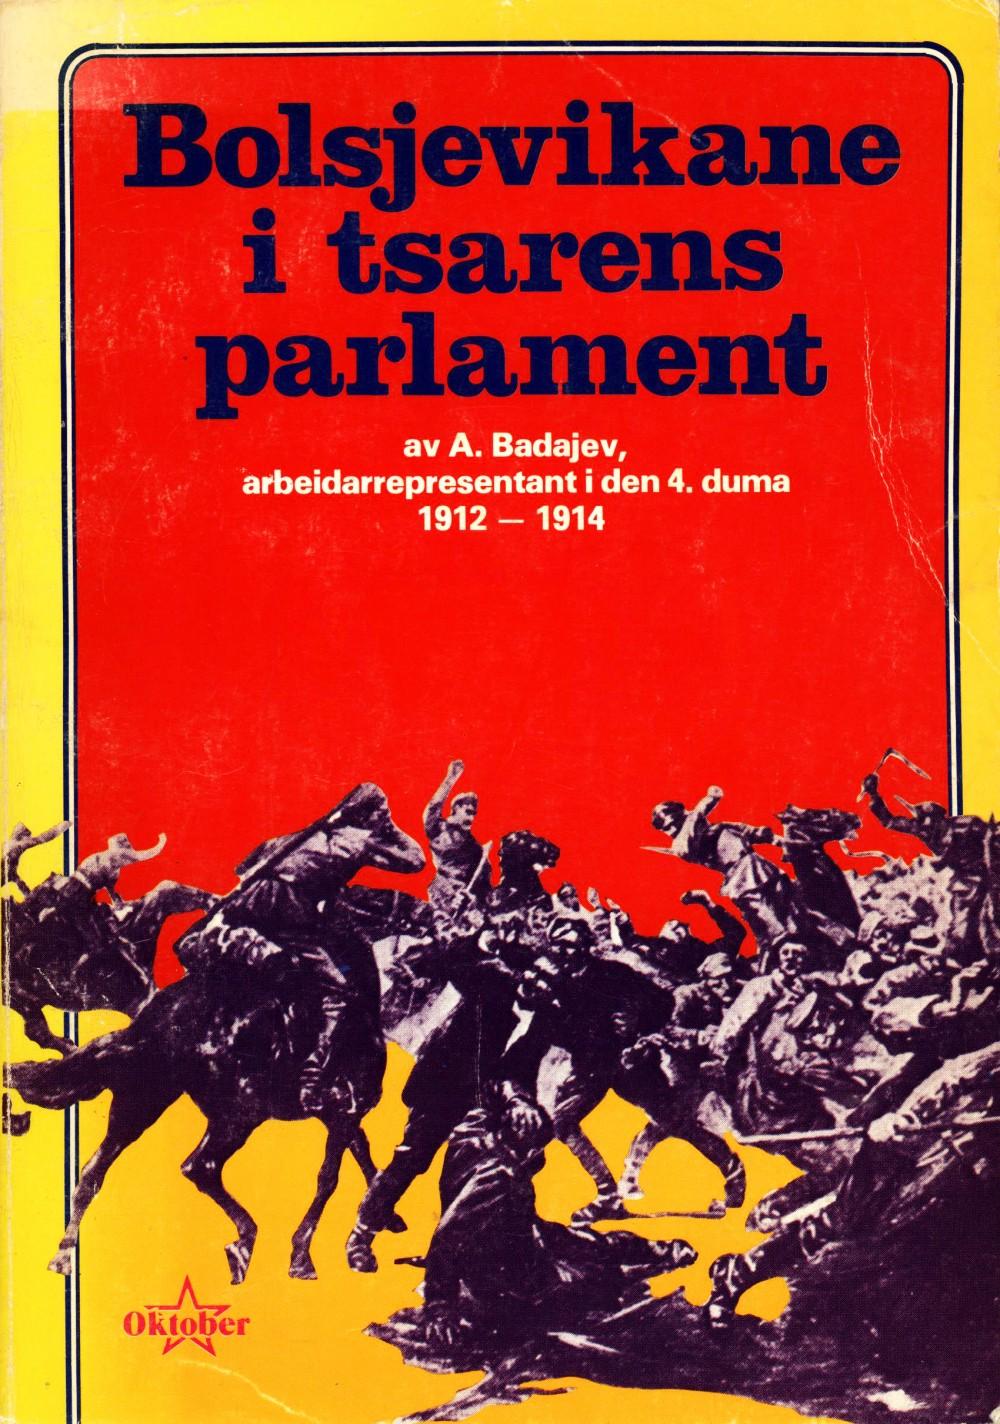 A. Badajev: Bolsjevikane i tsarens parlament